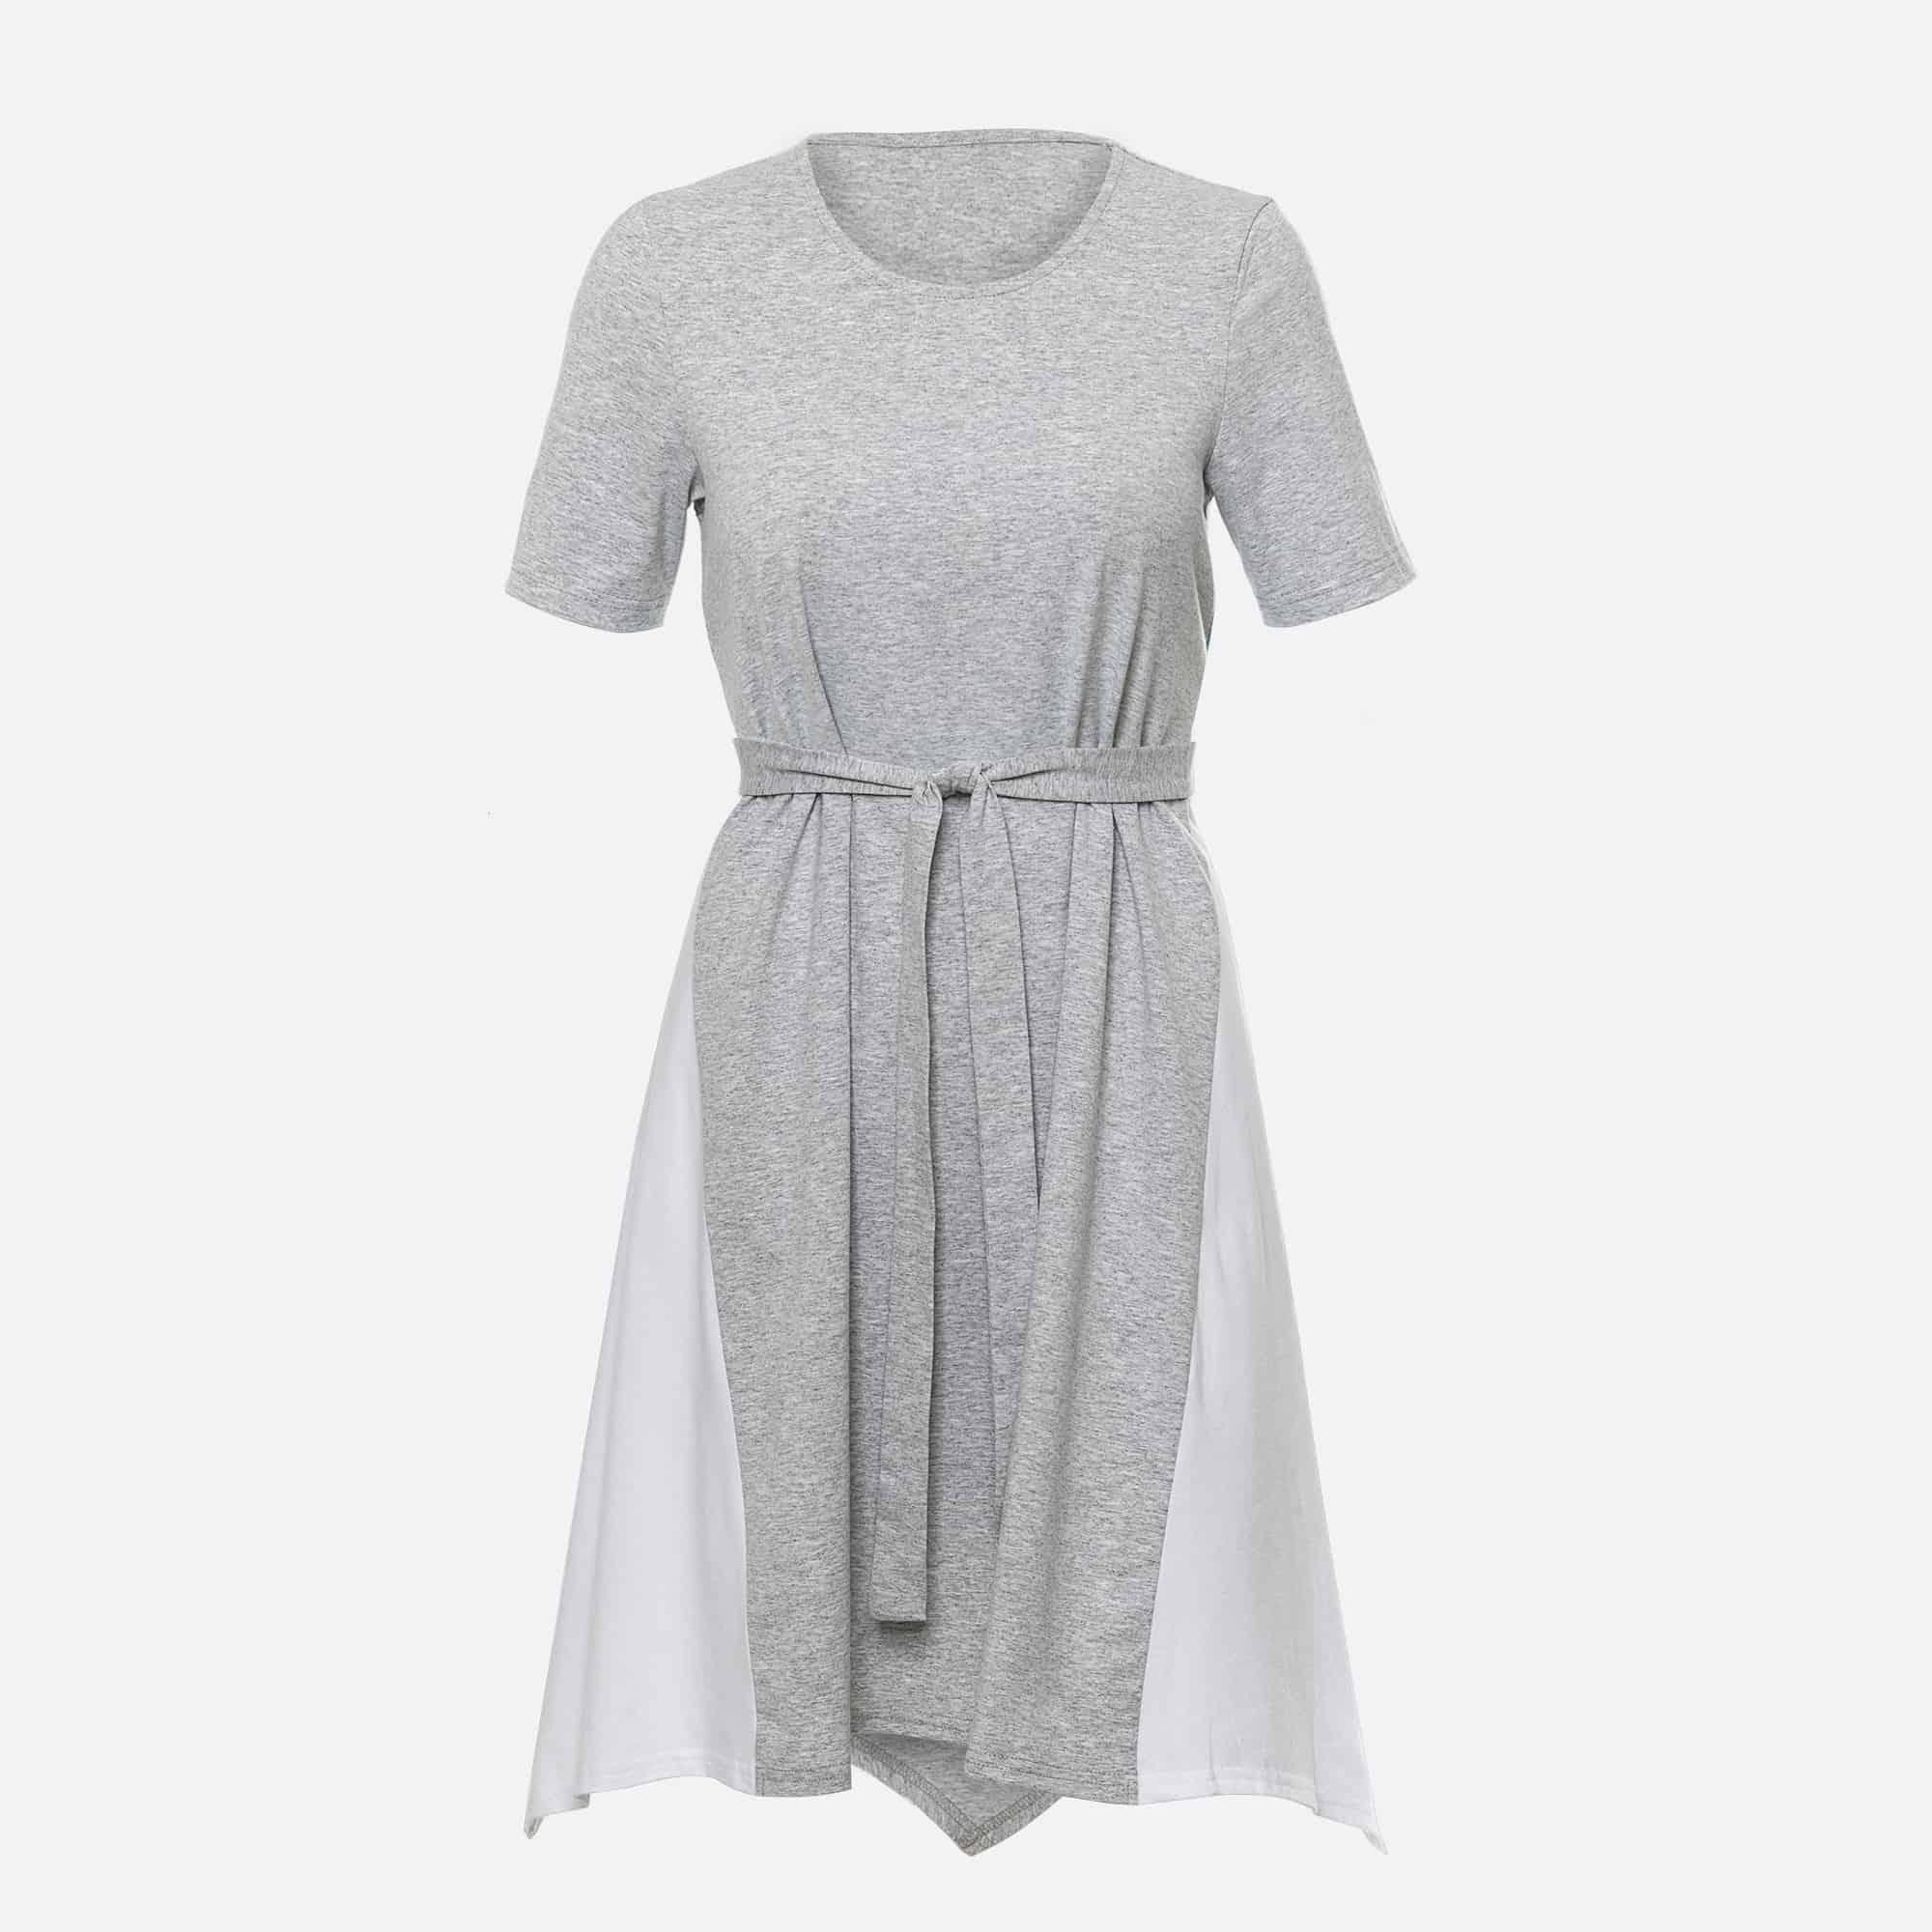 946b224986a Marat - Naiste puuvillane kleit valgete detailide ja vööga